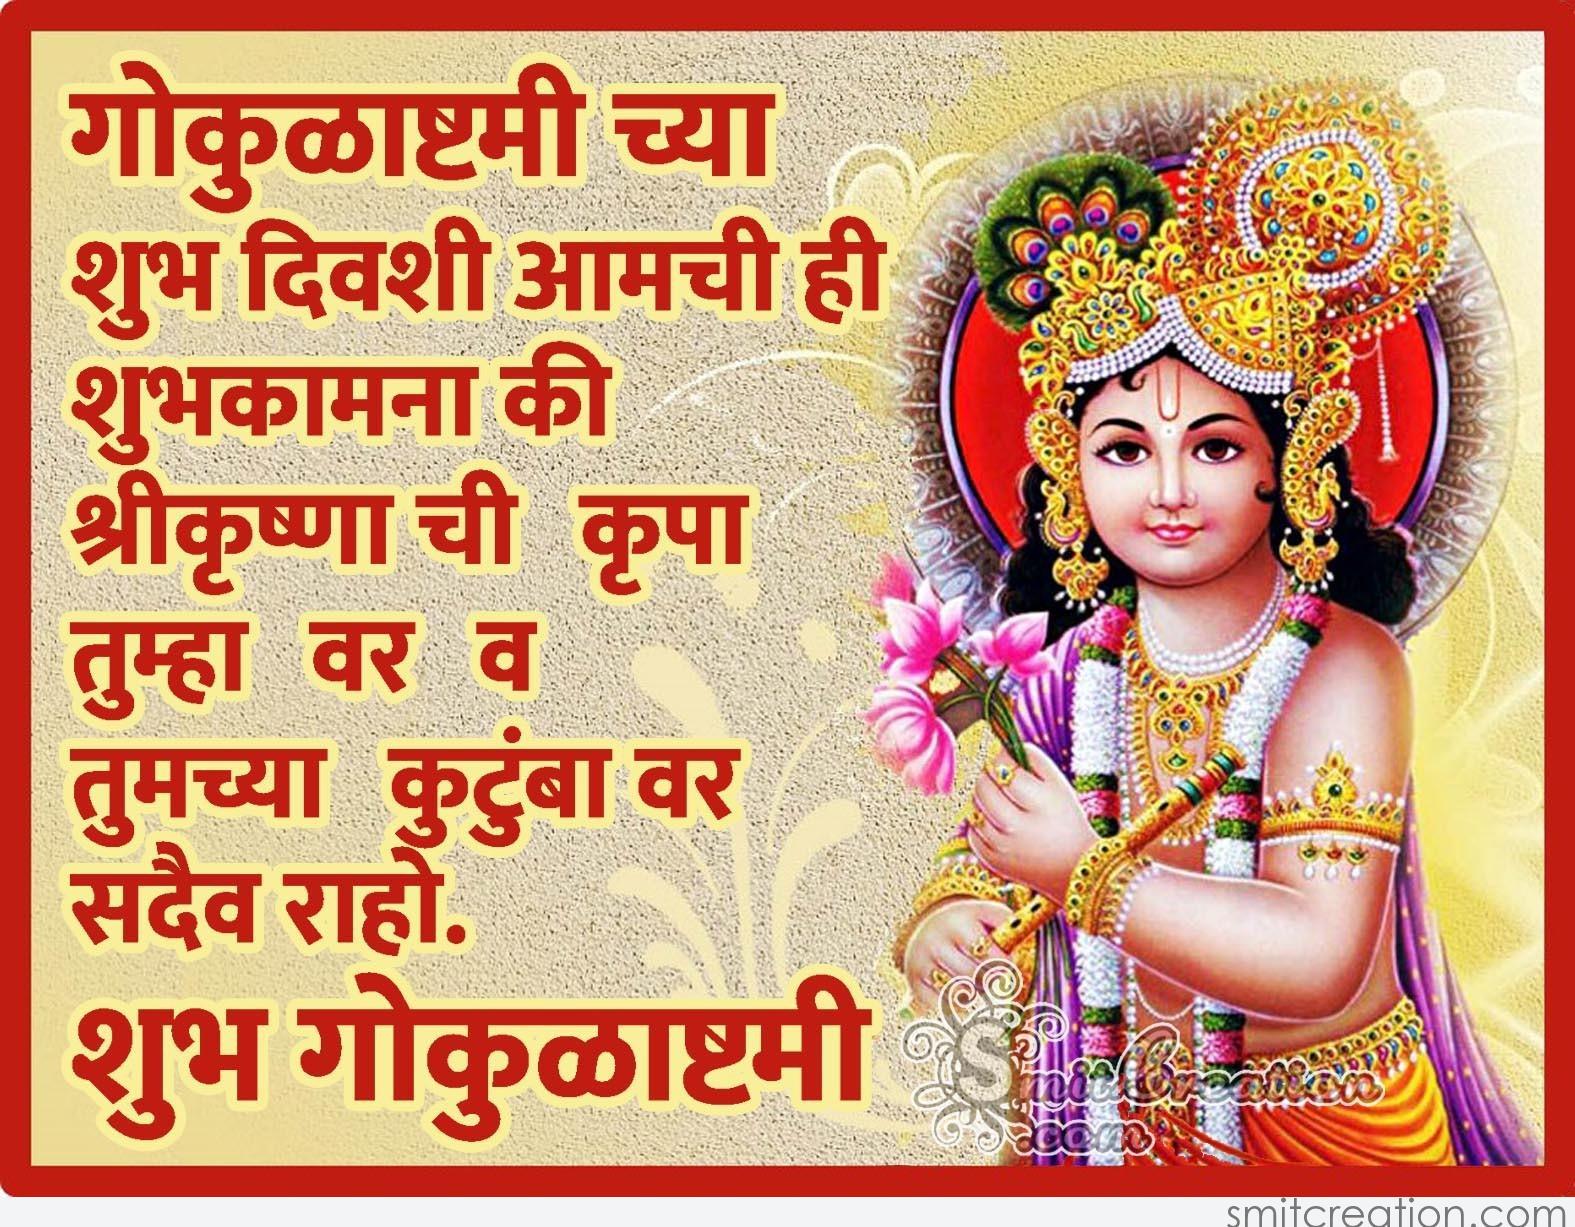 Janmashtami Wishes In Marathi Pinterest thumbnail